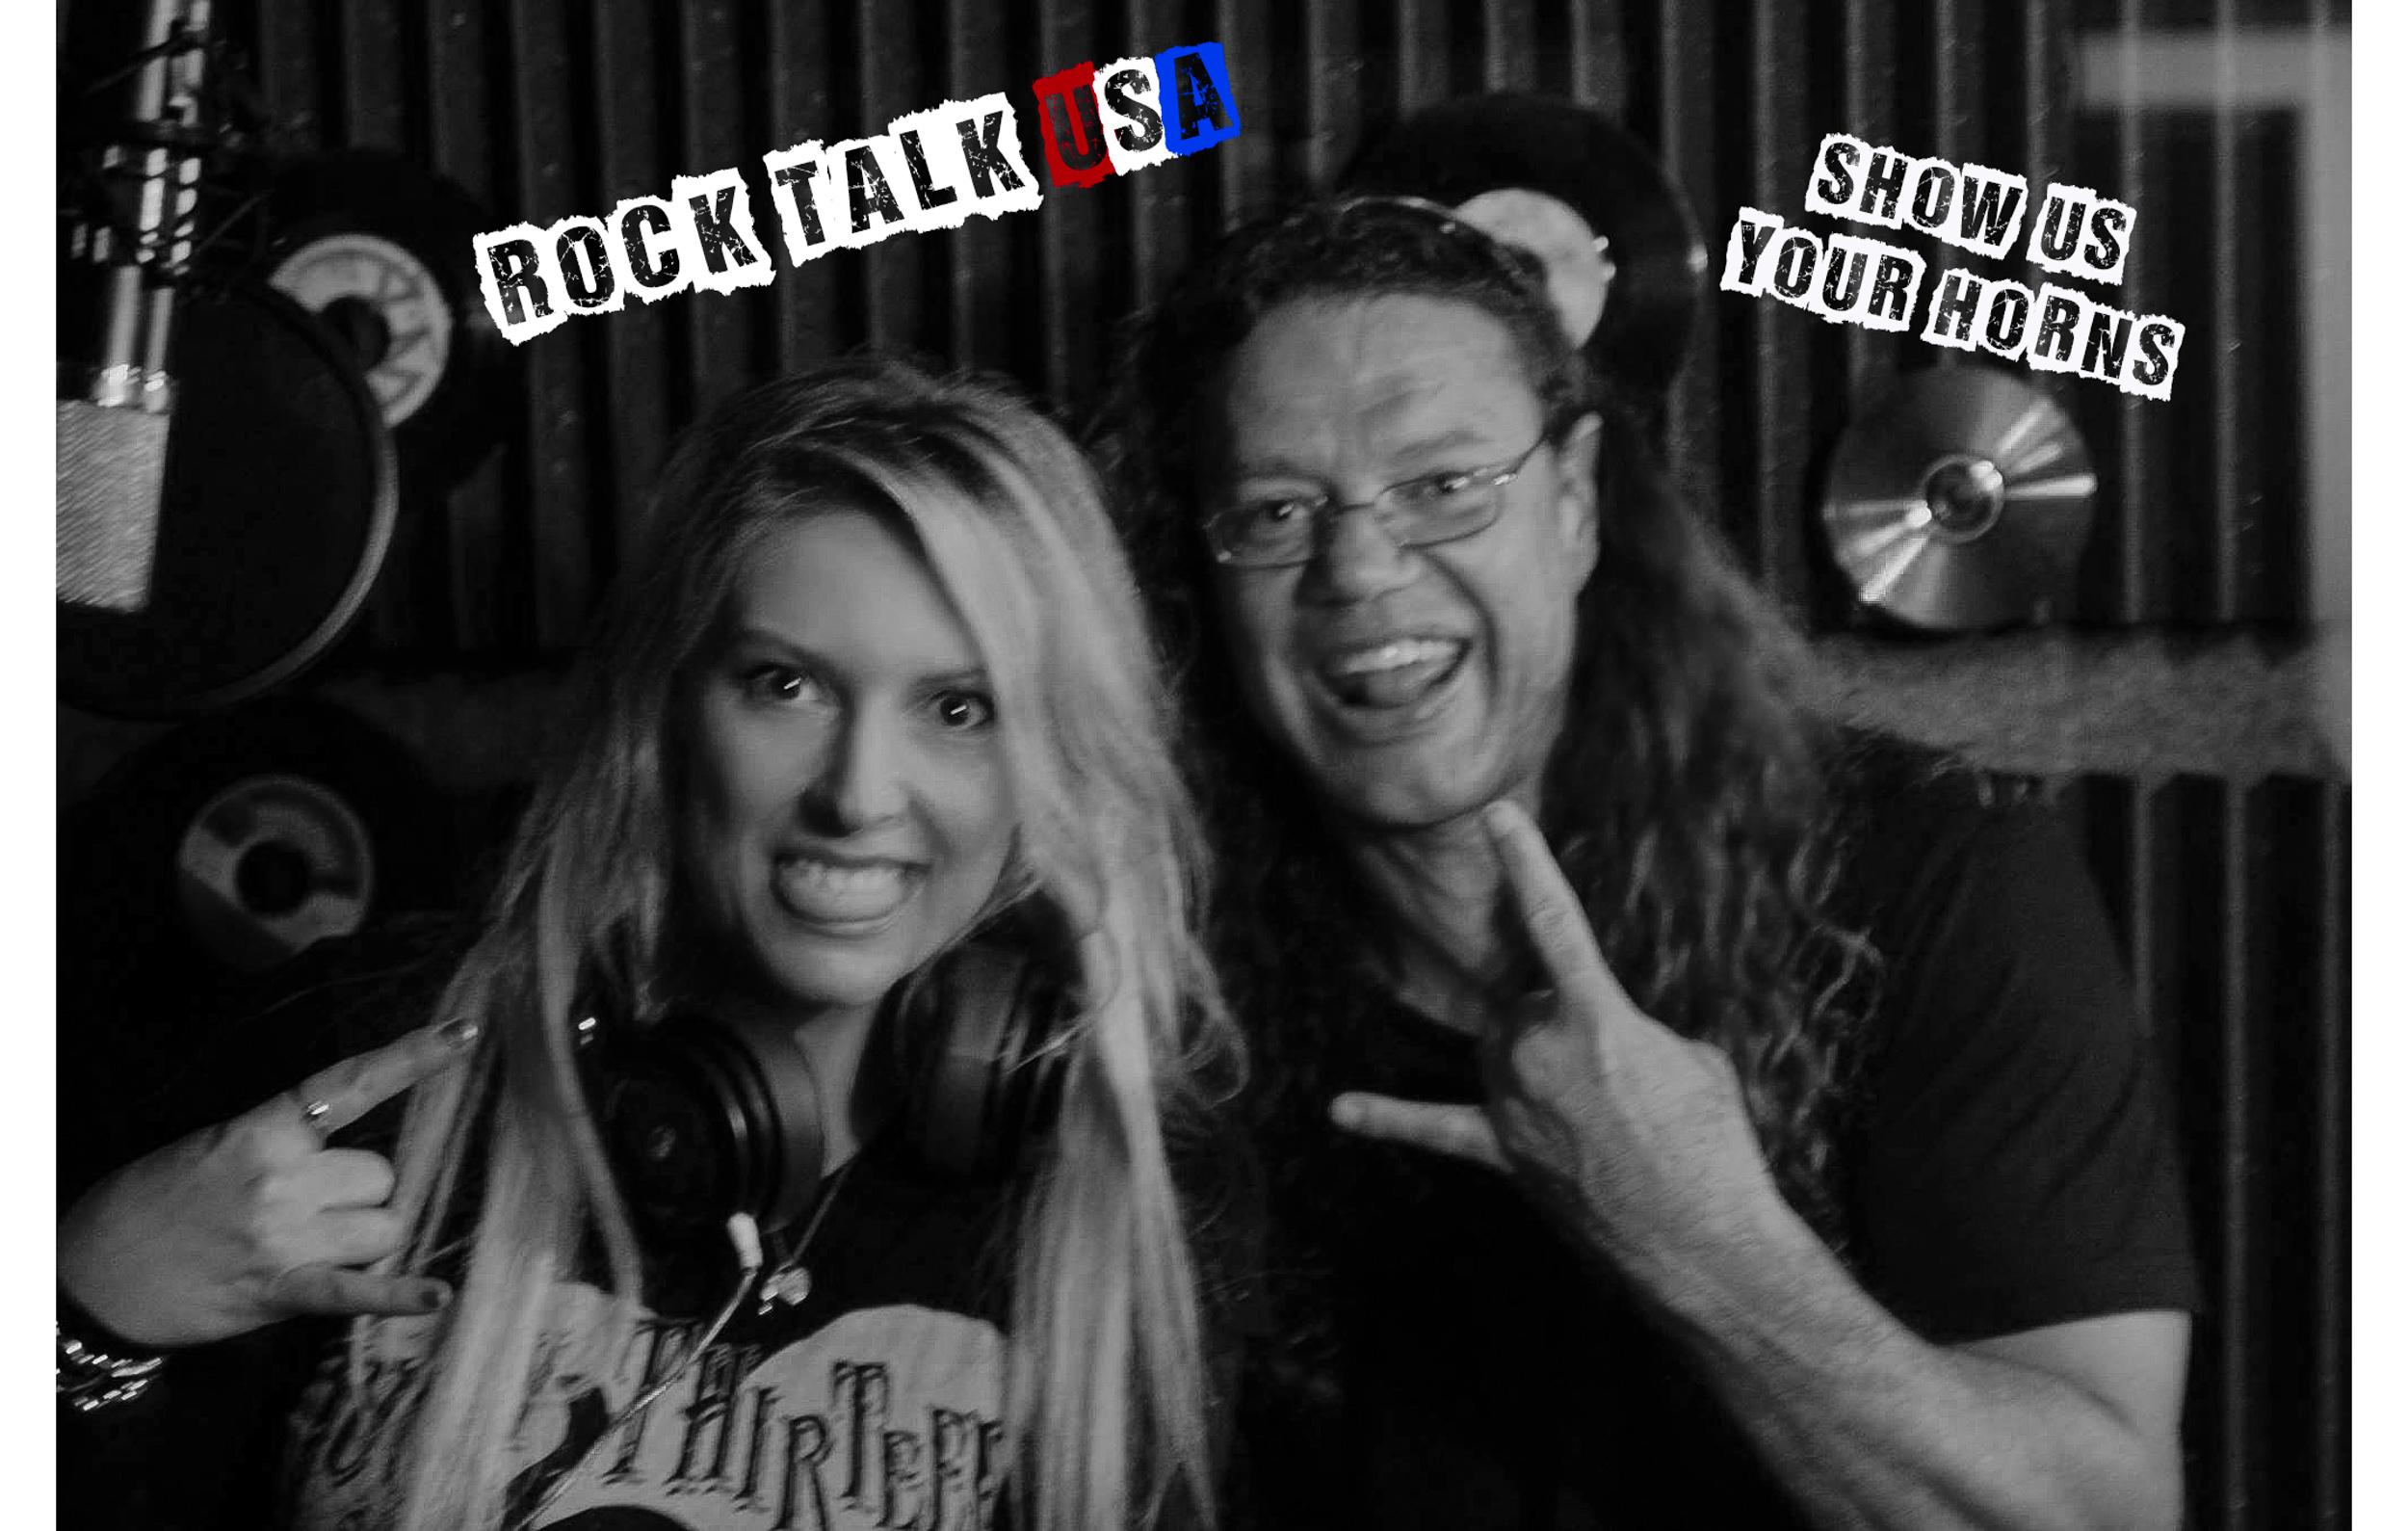 Rock talk production-Edit.jpg